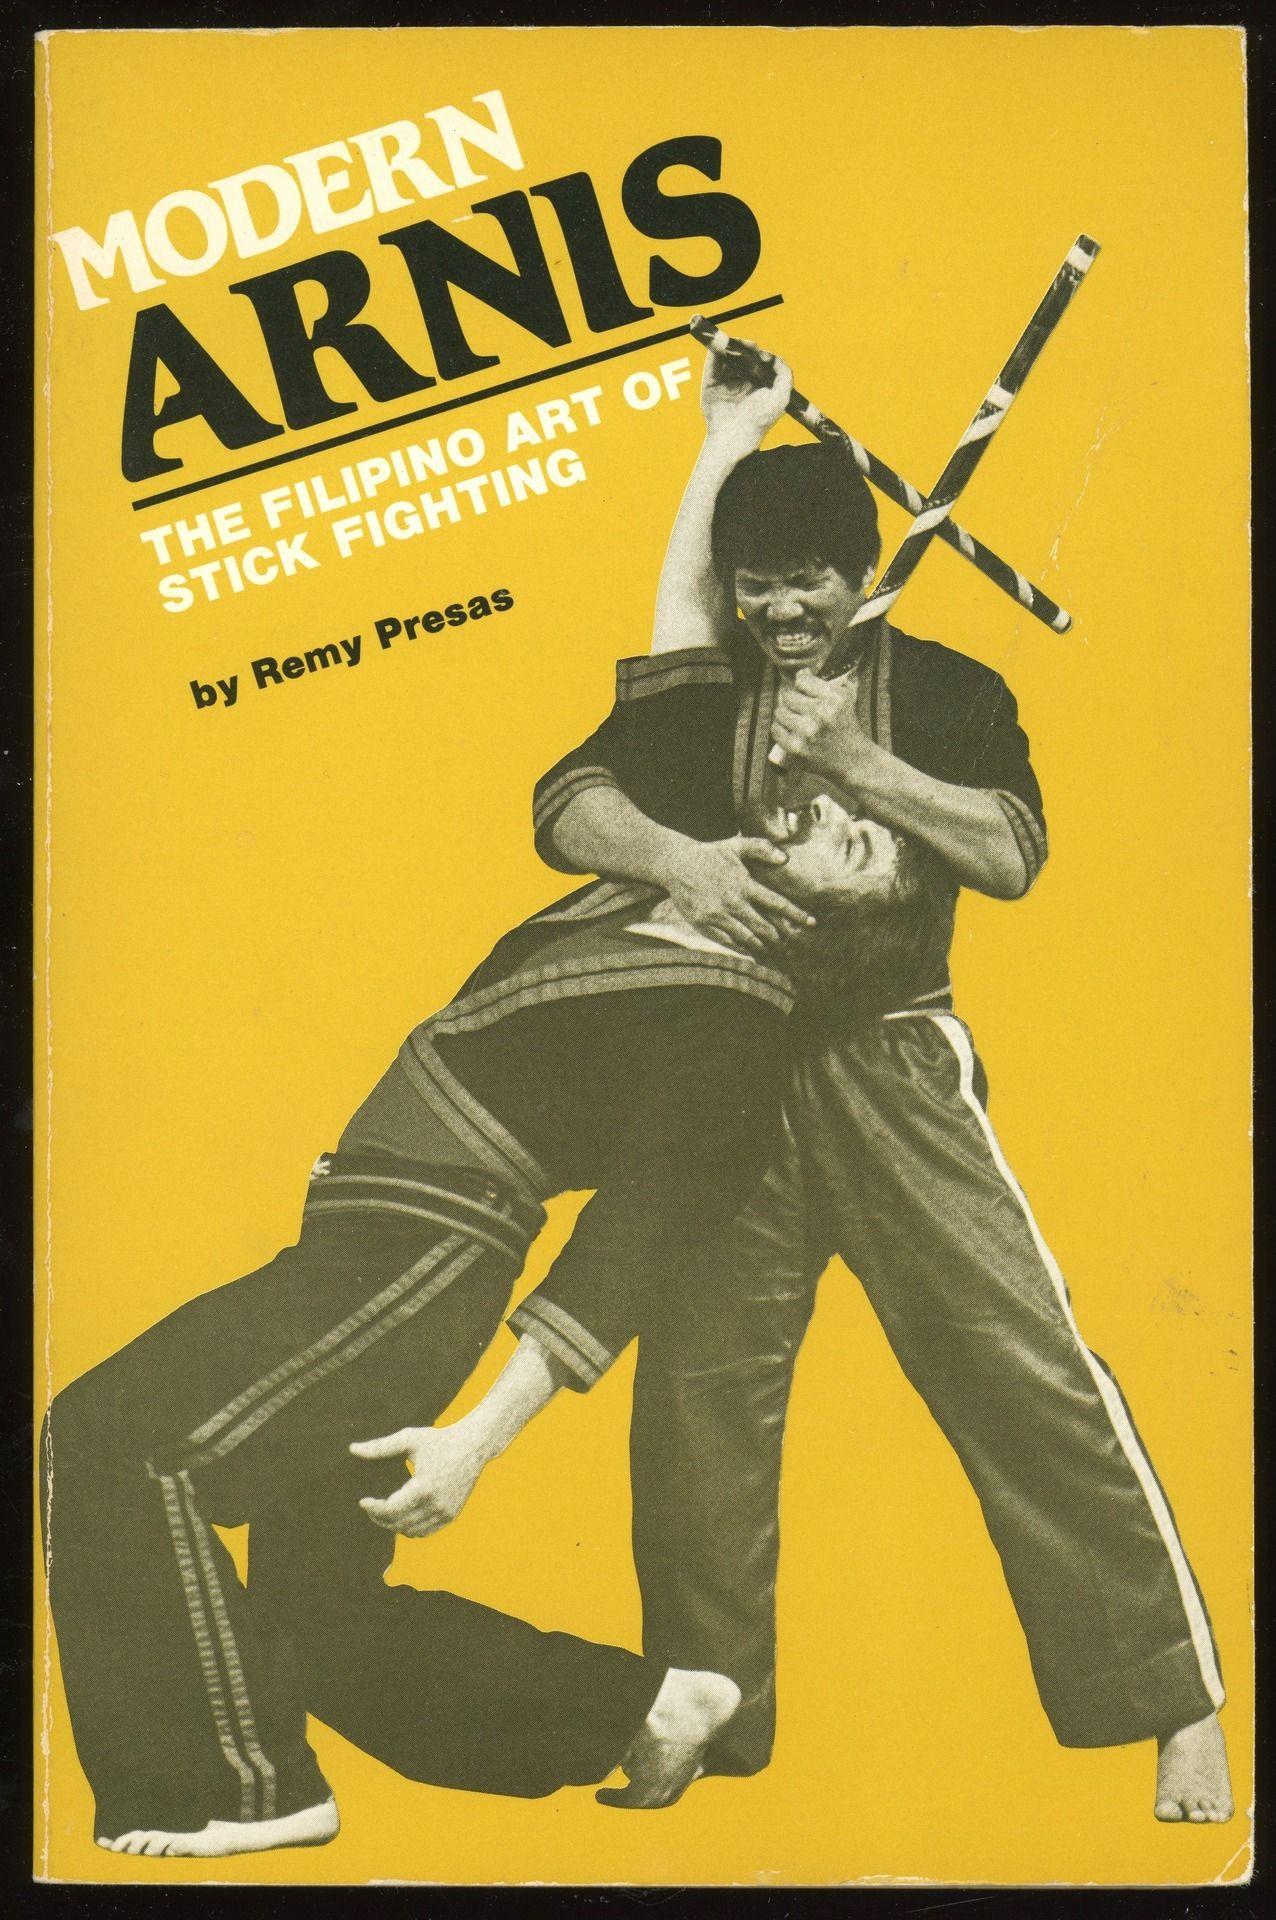 modern arnis: the filipino art of stick fighting (1983) | filipino ...